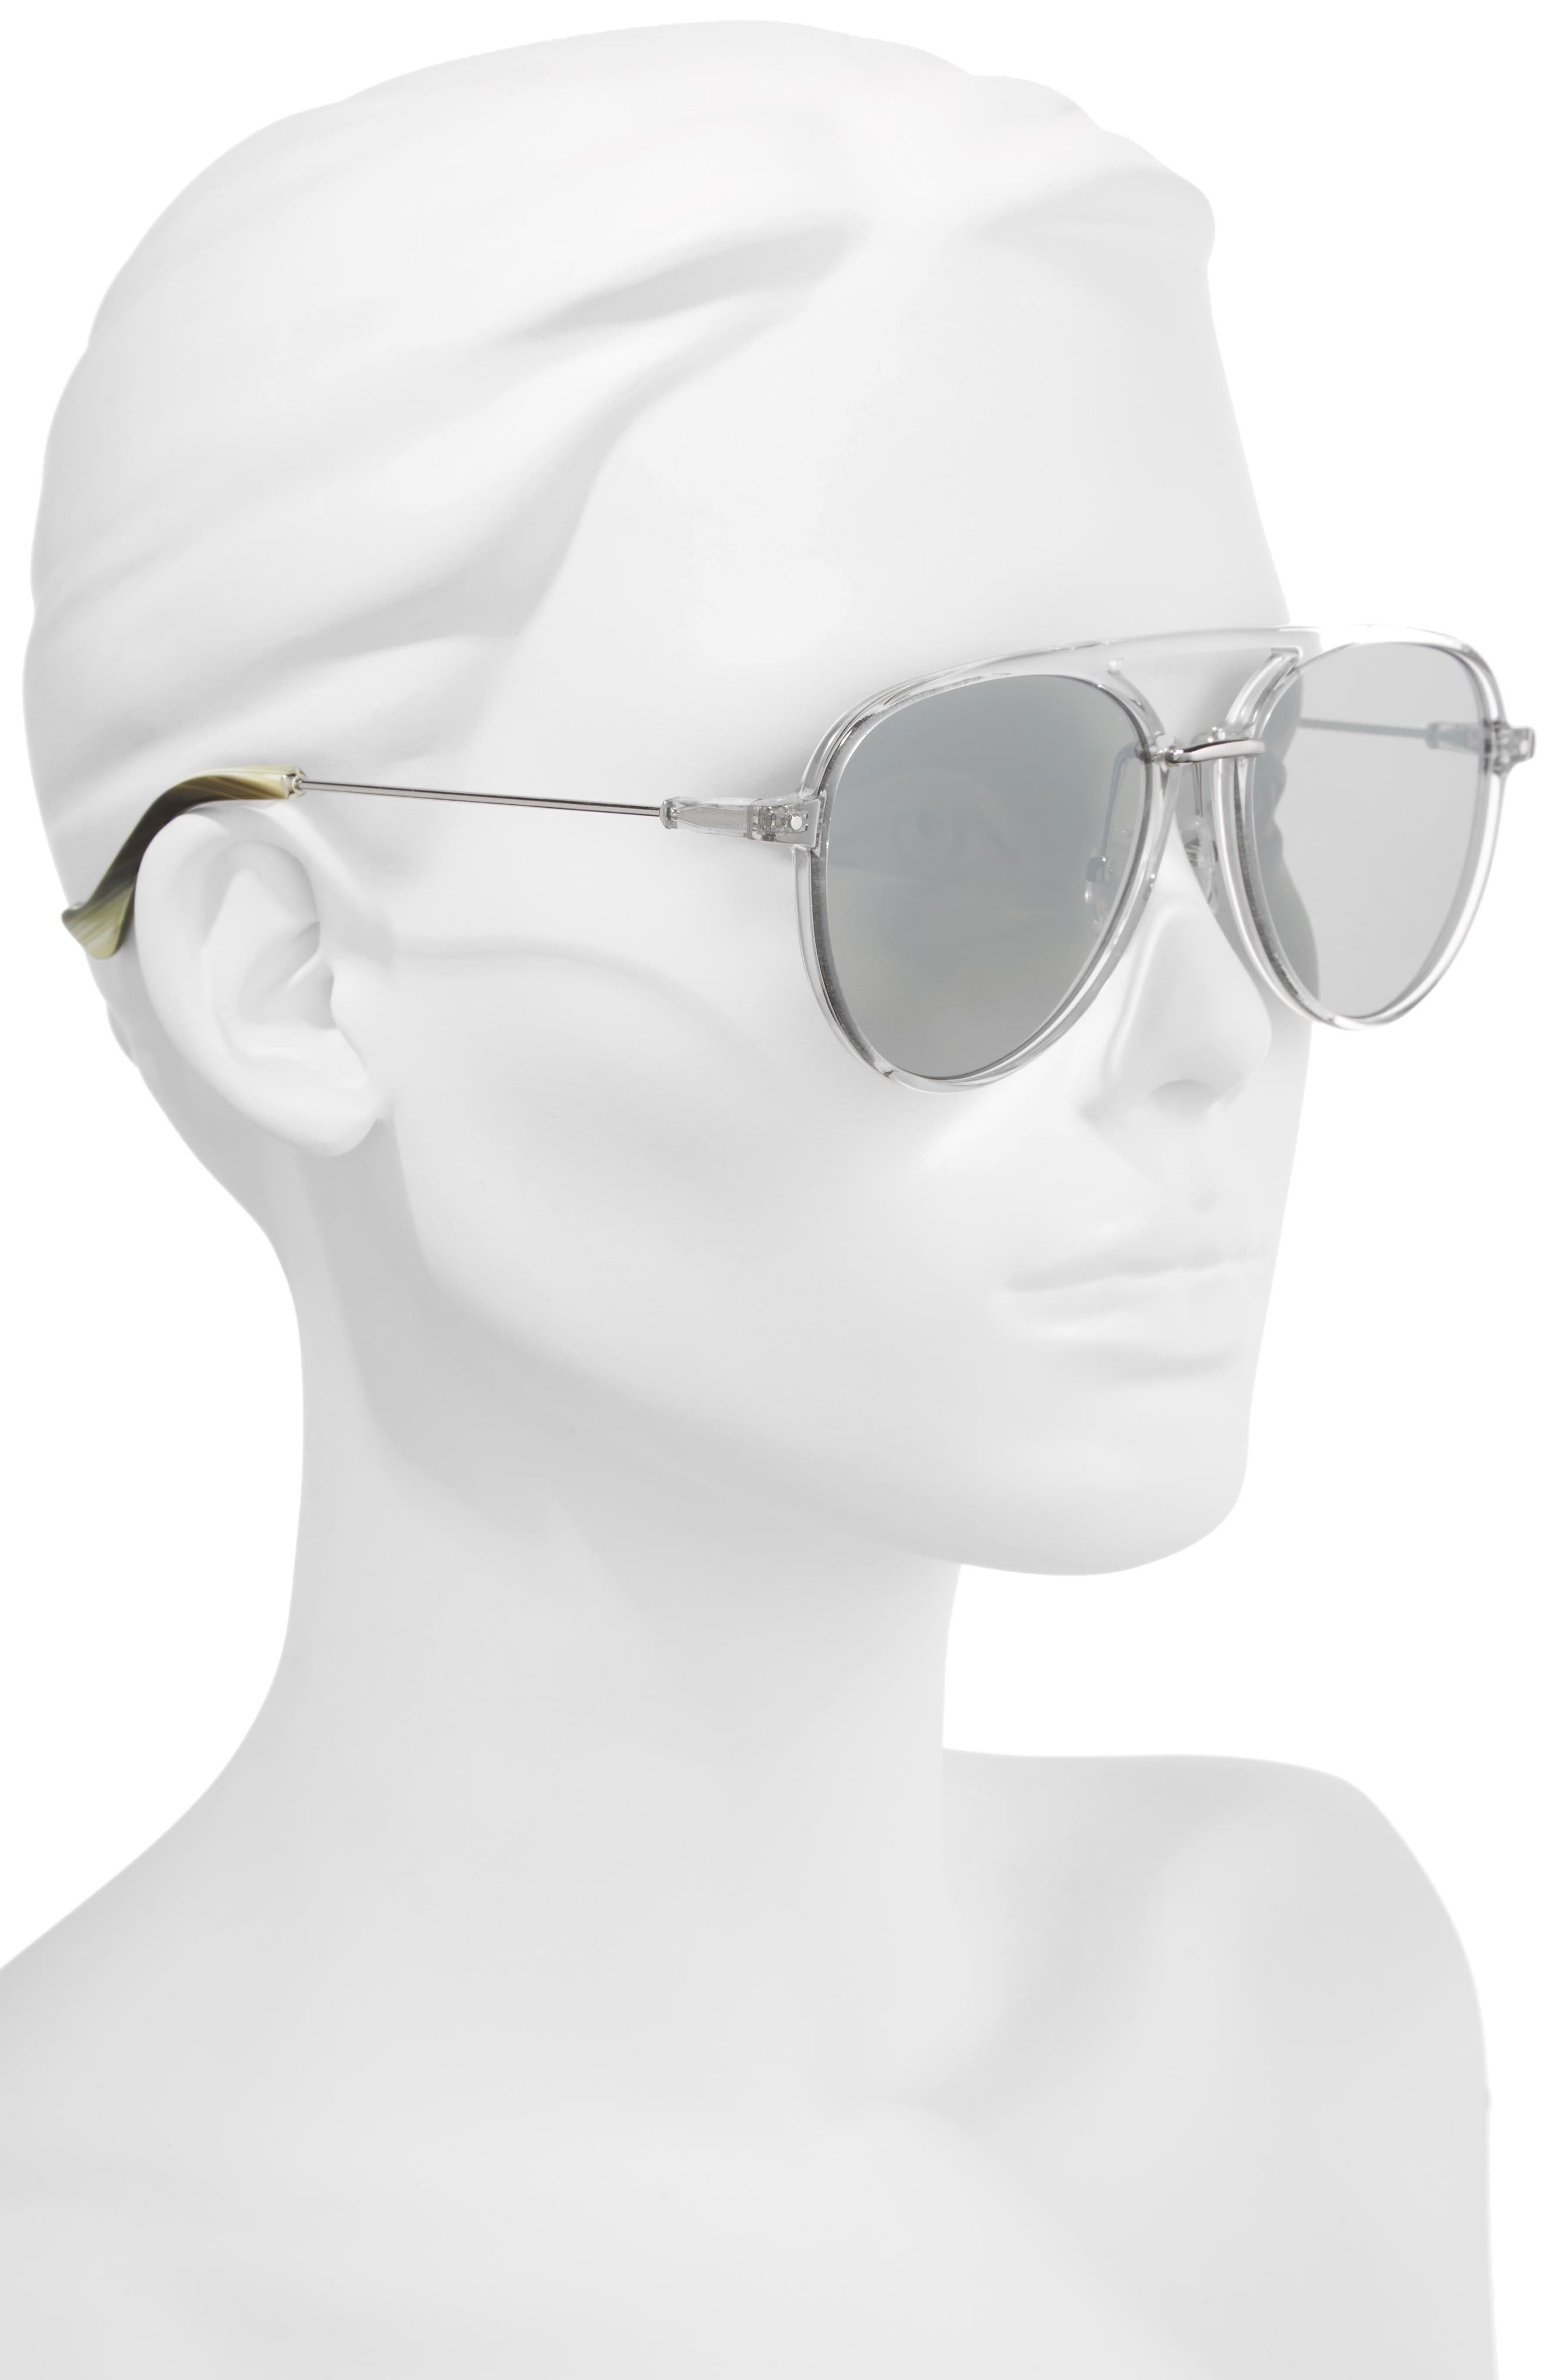 Praph 57mm Sunglasses,                             Alternate thumbnail 2, color,                             SILVER LENS/ CLEAR HARDWARE